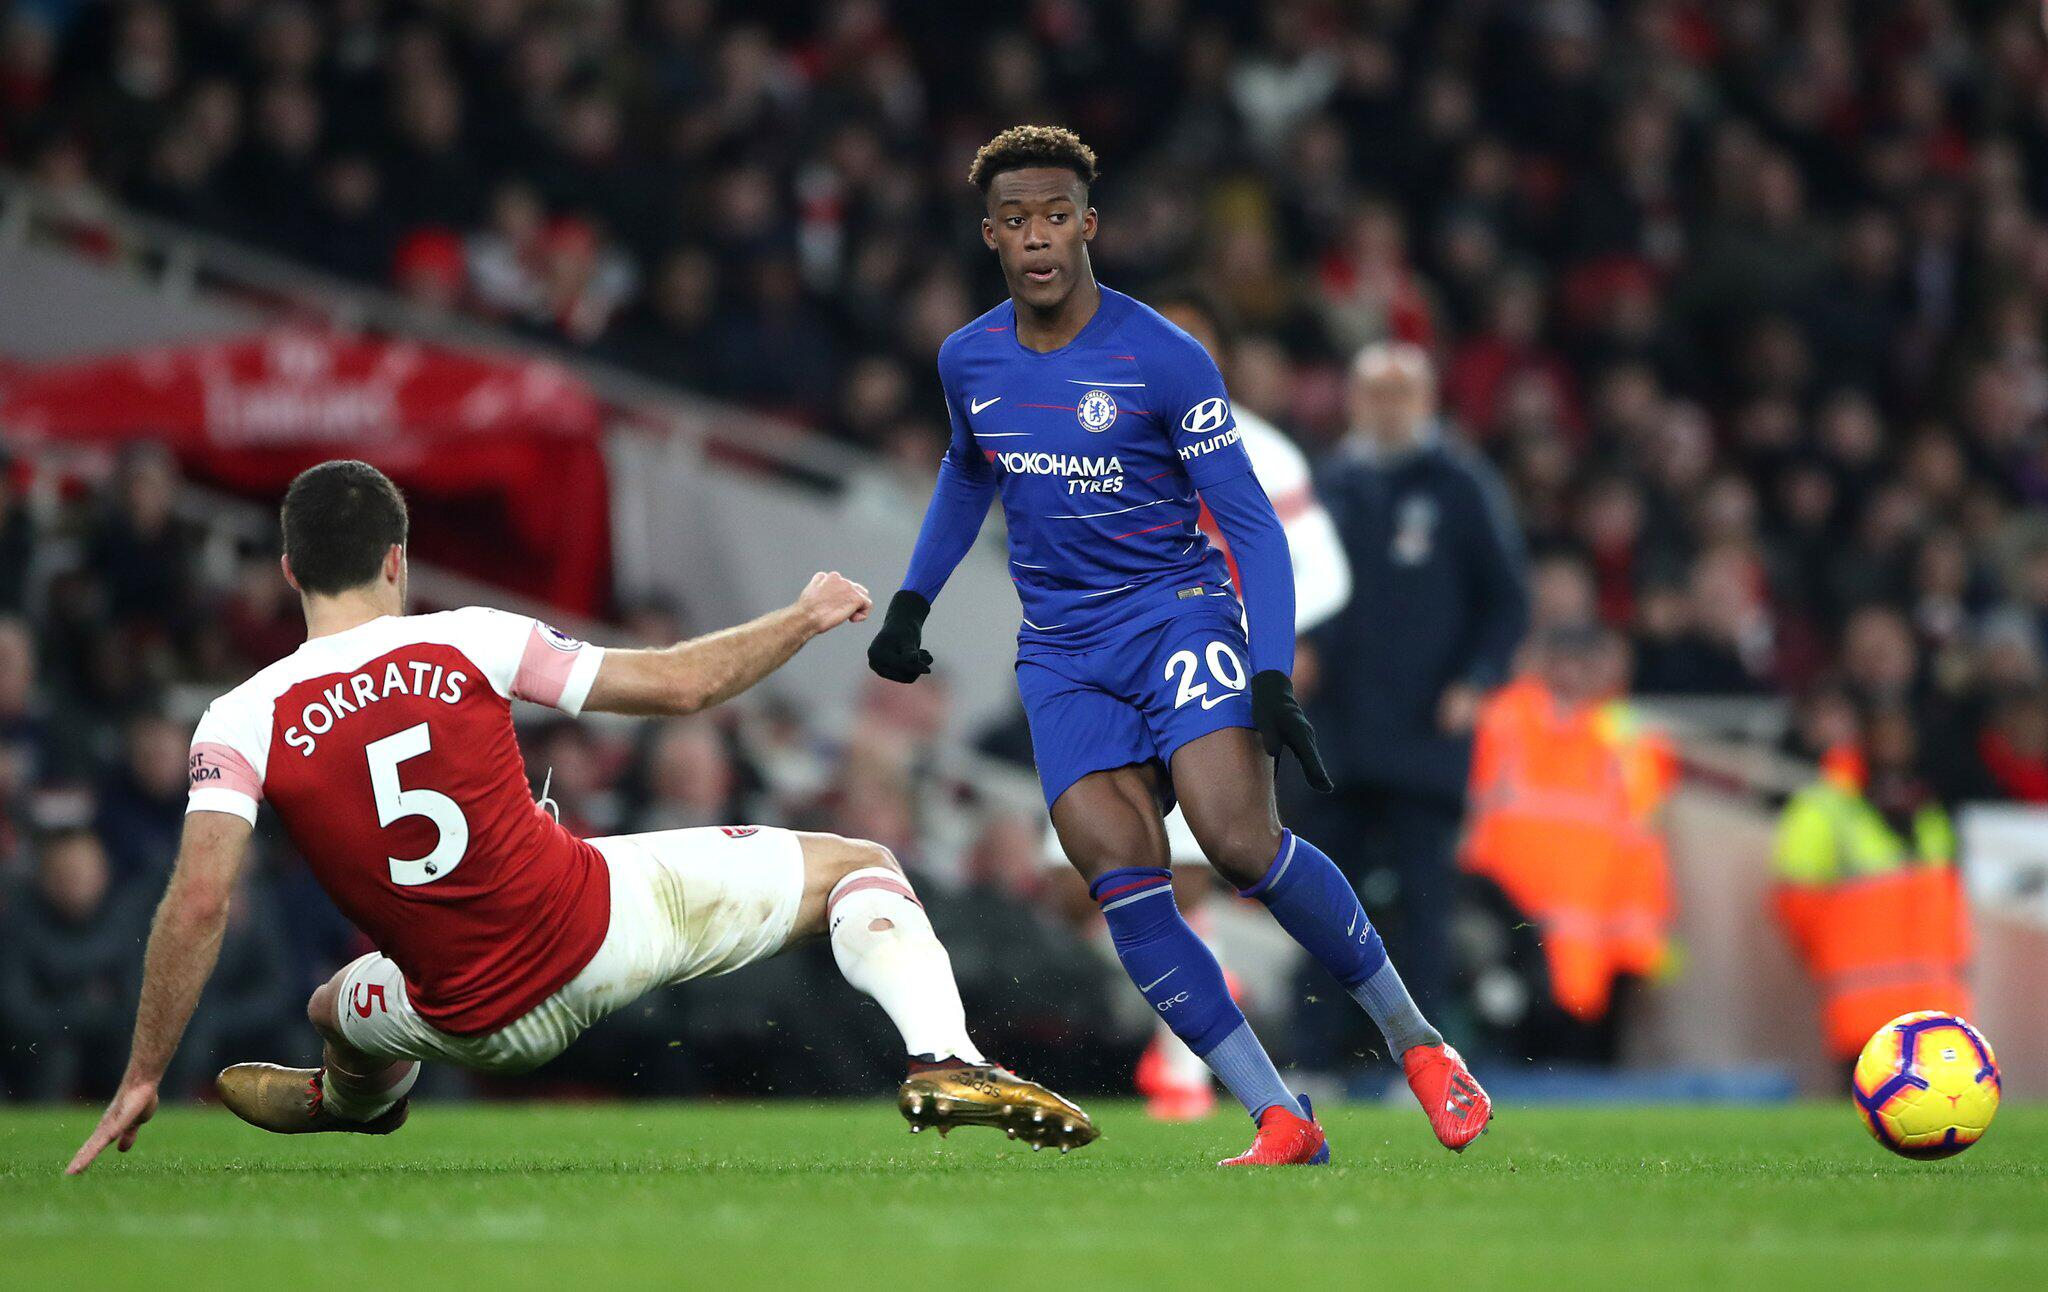 Bild zu Callum Hudson-Odoi, Sokratis Papastathopoulos, FC Arsenal London, FC Chelsea London, Premier League